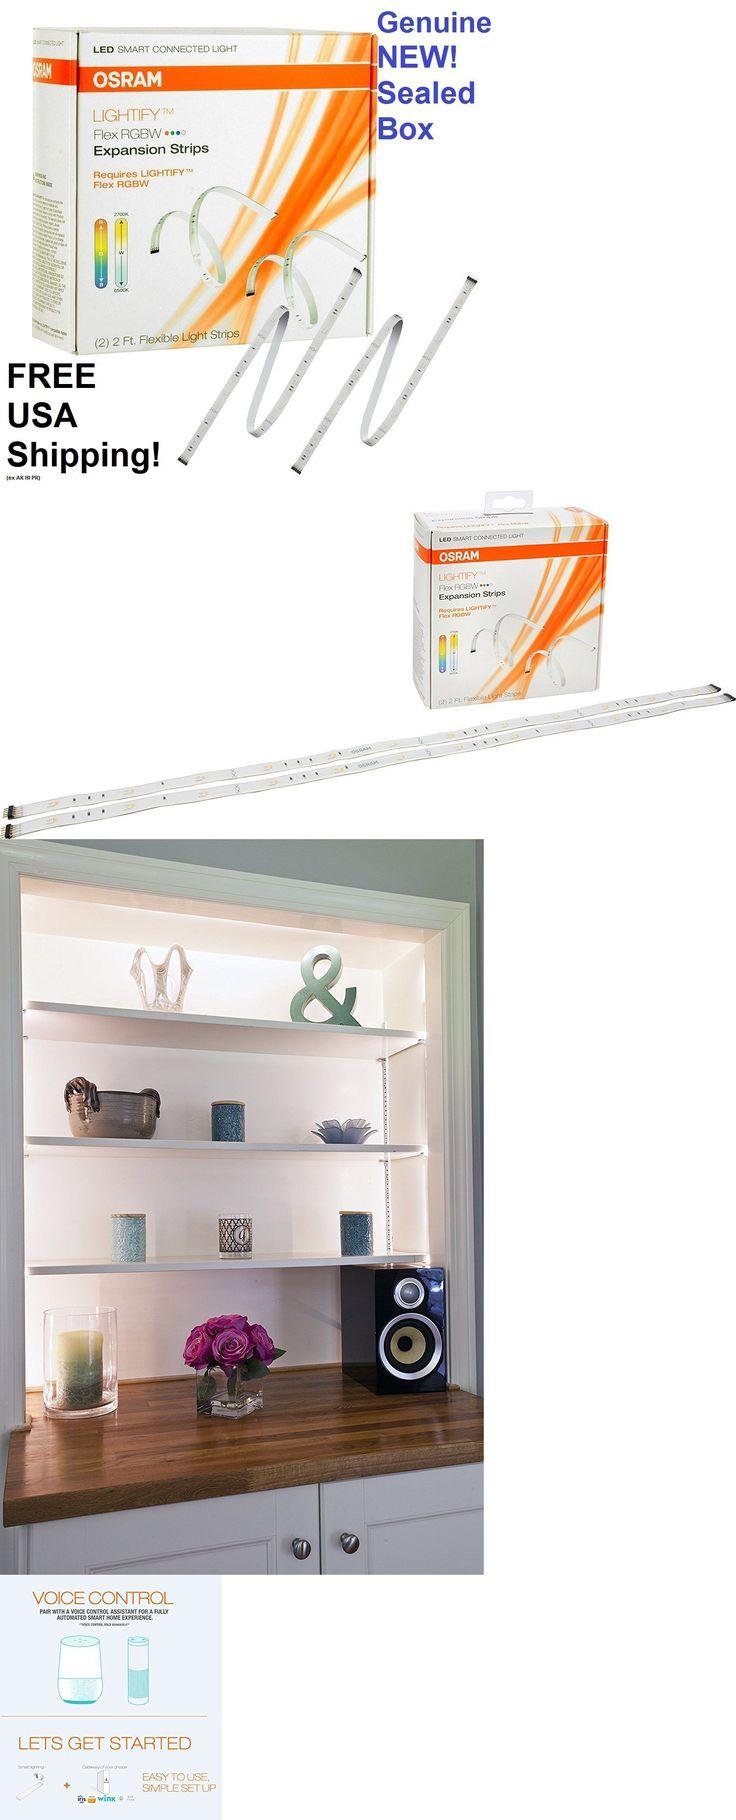 17 best ideas about osram lightify on pinterest led. Black Bedroom Furniture Sets. Home Design Ideas